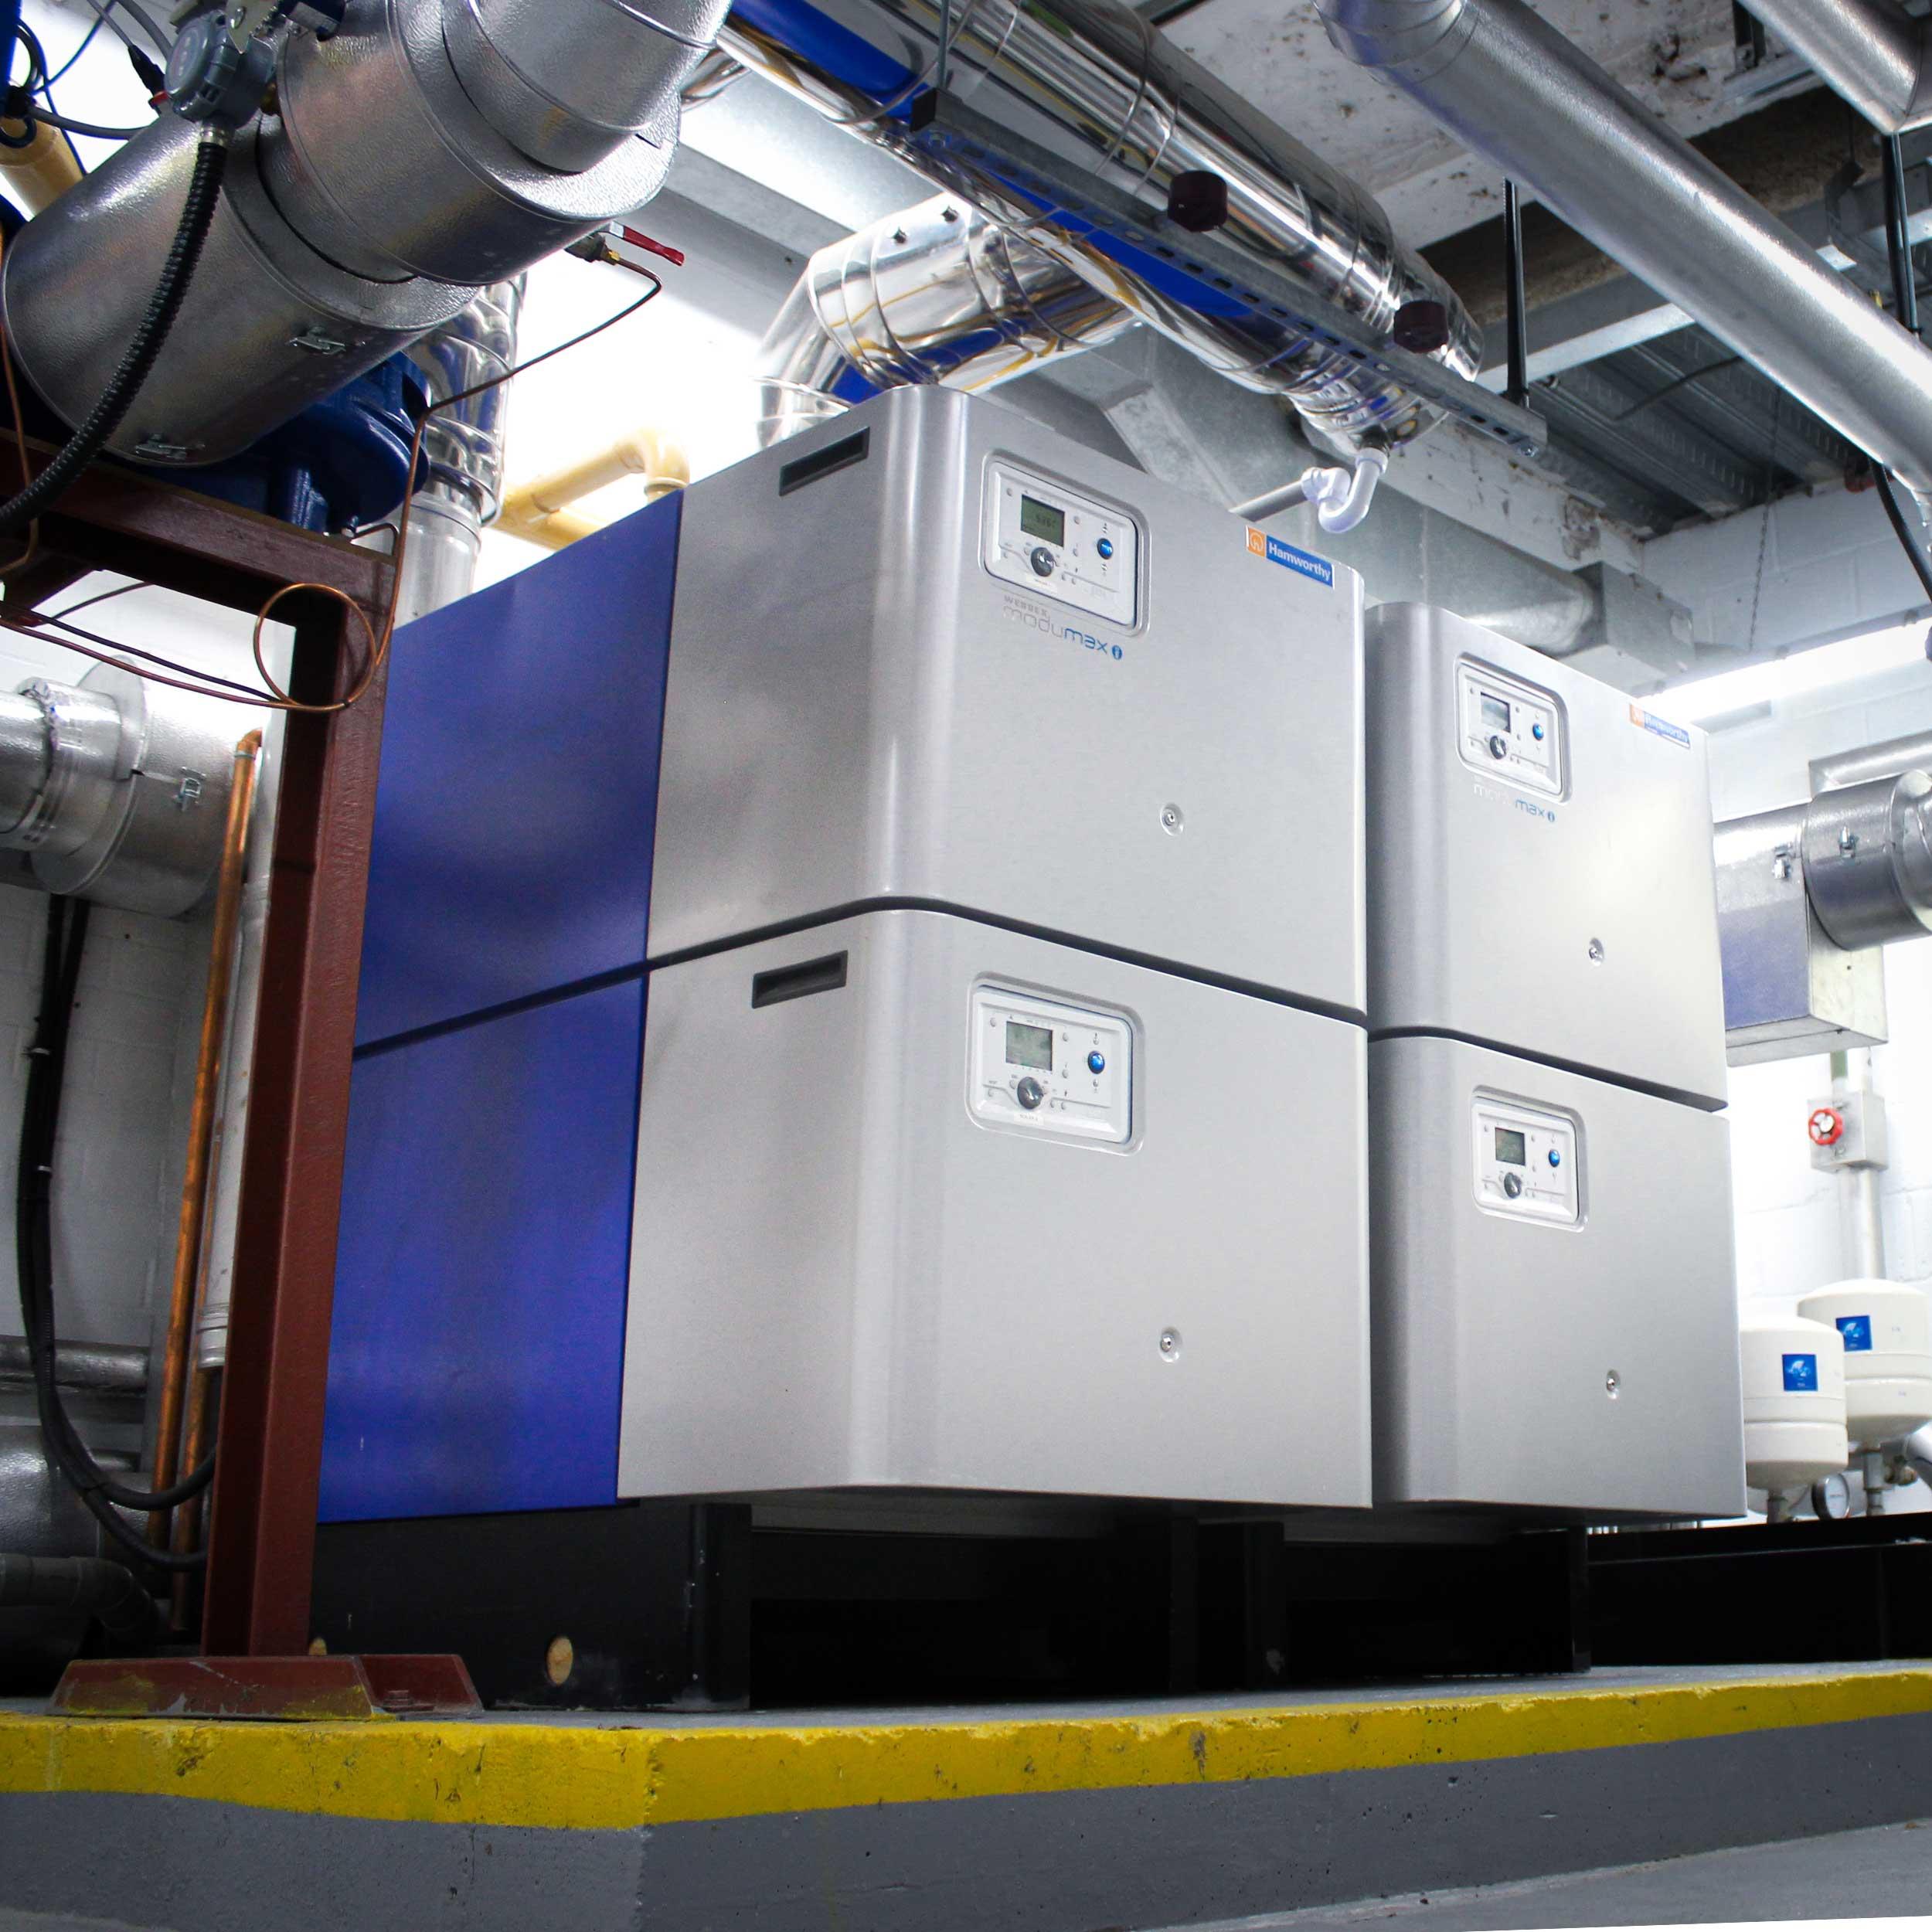 Commercial-boiler-installation-boiler-in-basement-inside with blue paint